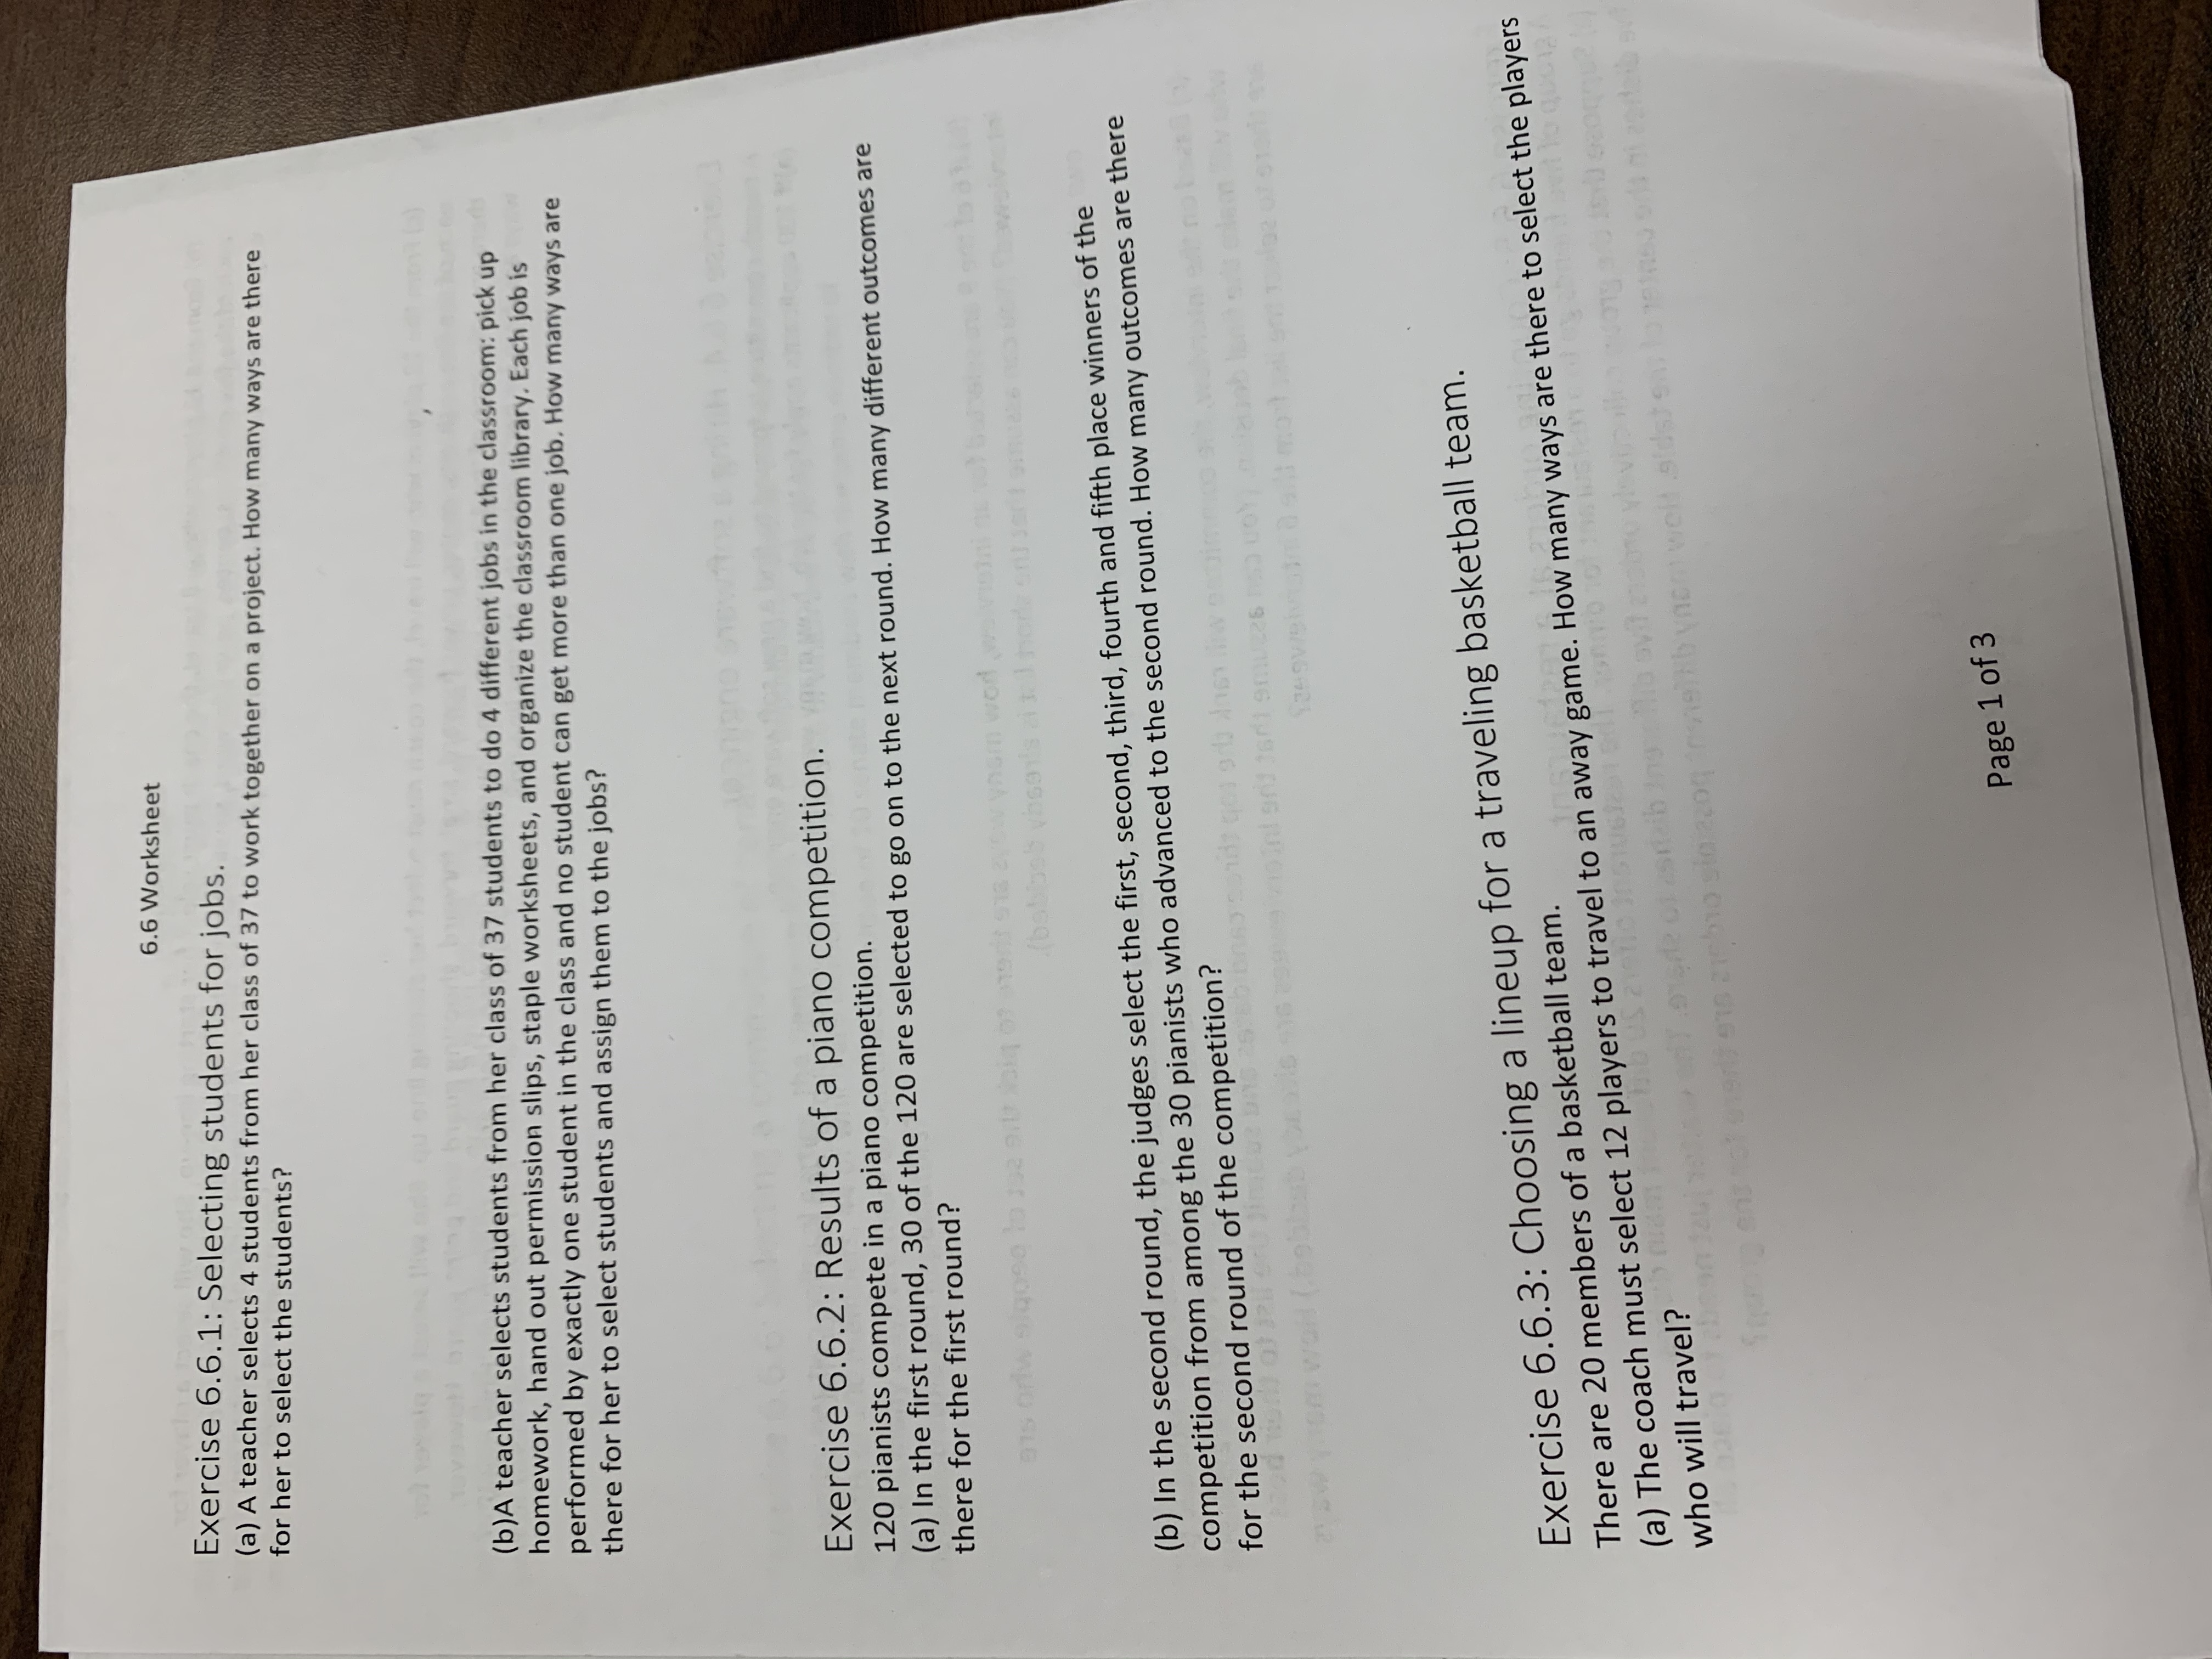 Answered 6 6 Worksheet Exercise 6 6 1 Selecting